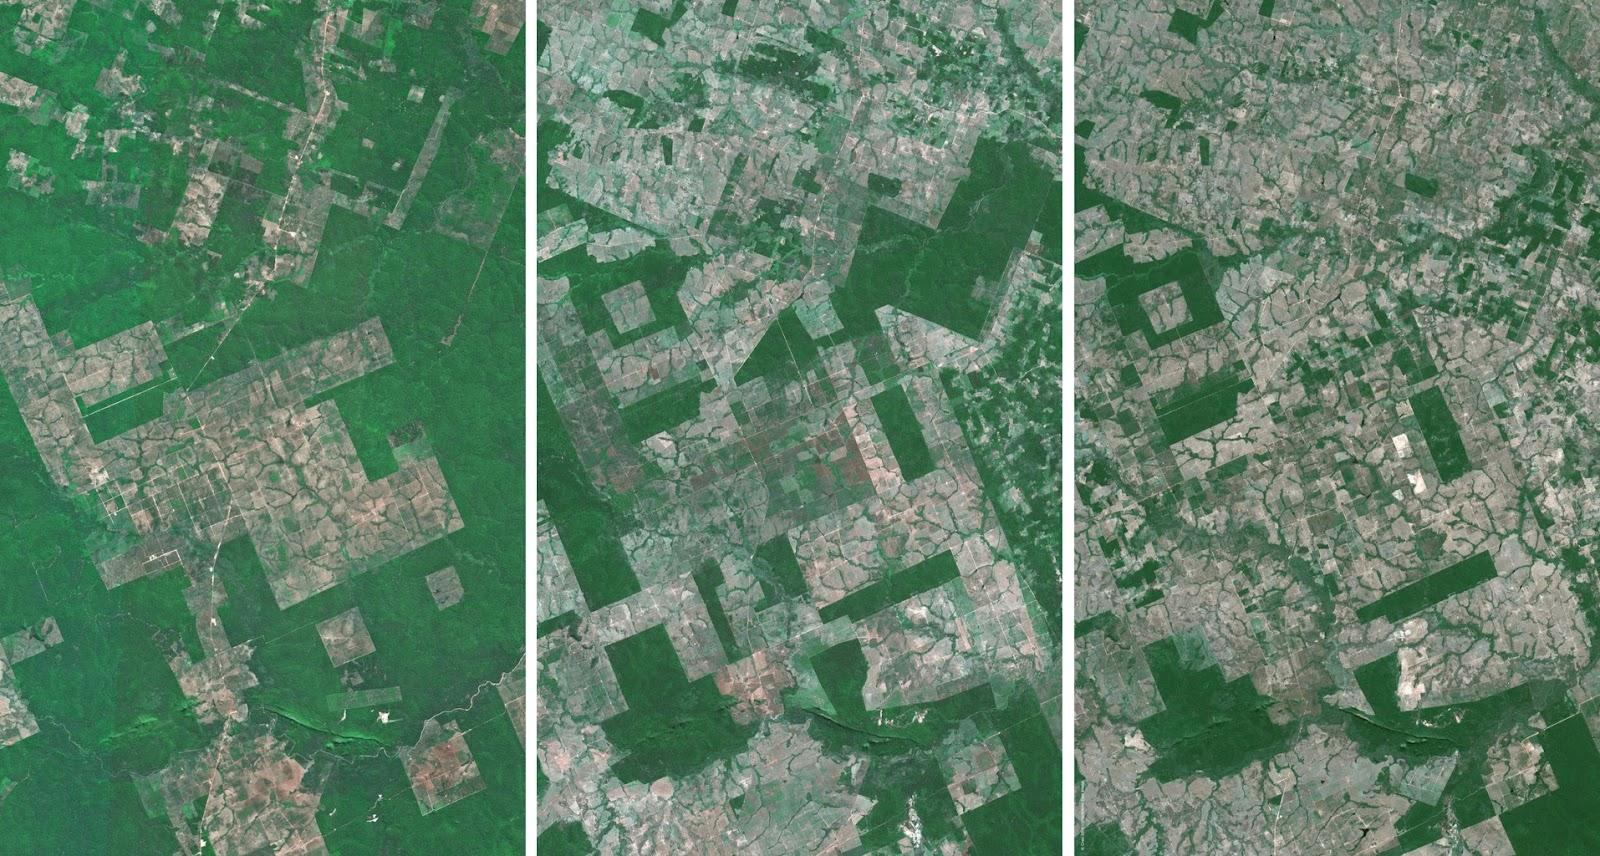 Global Forest Watch - deforestation